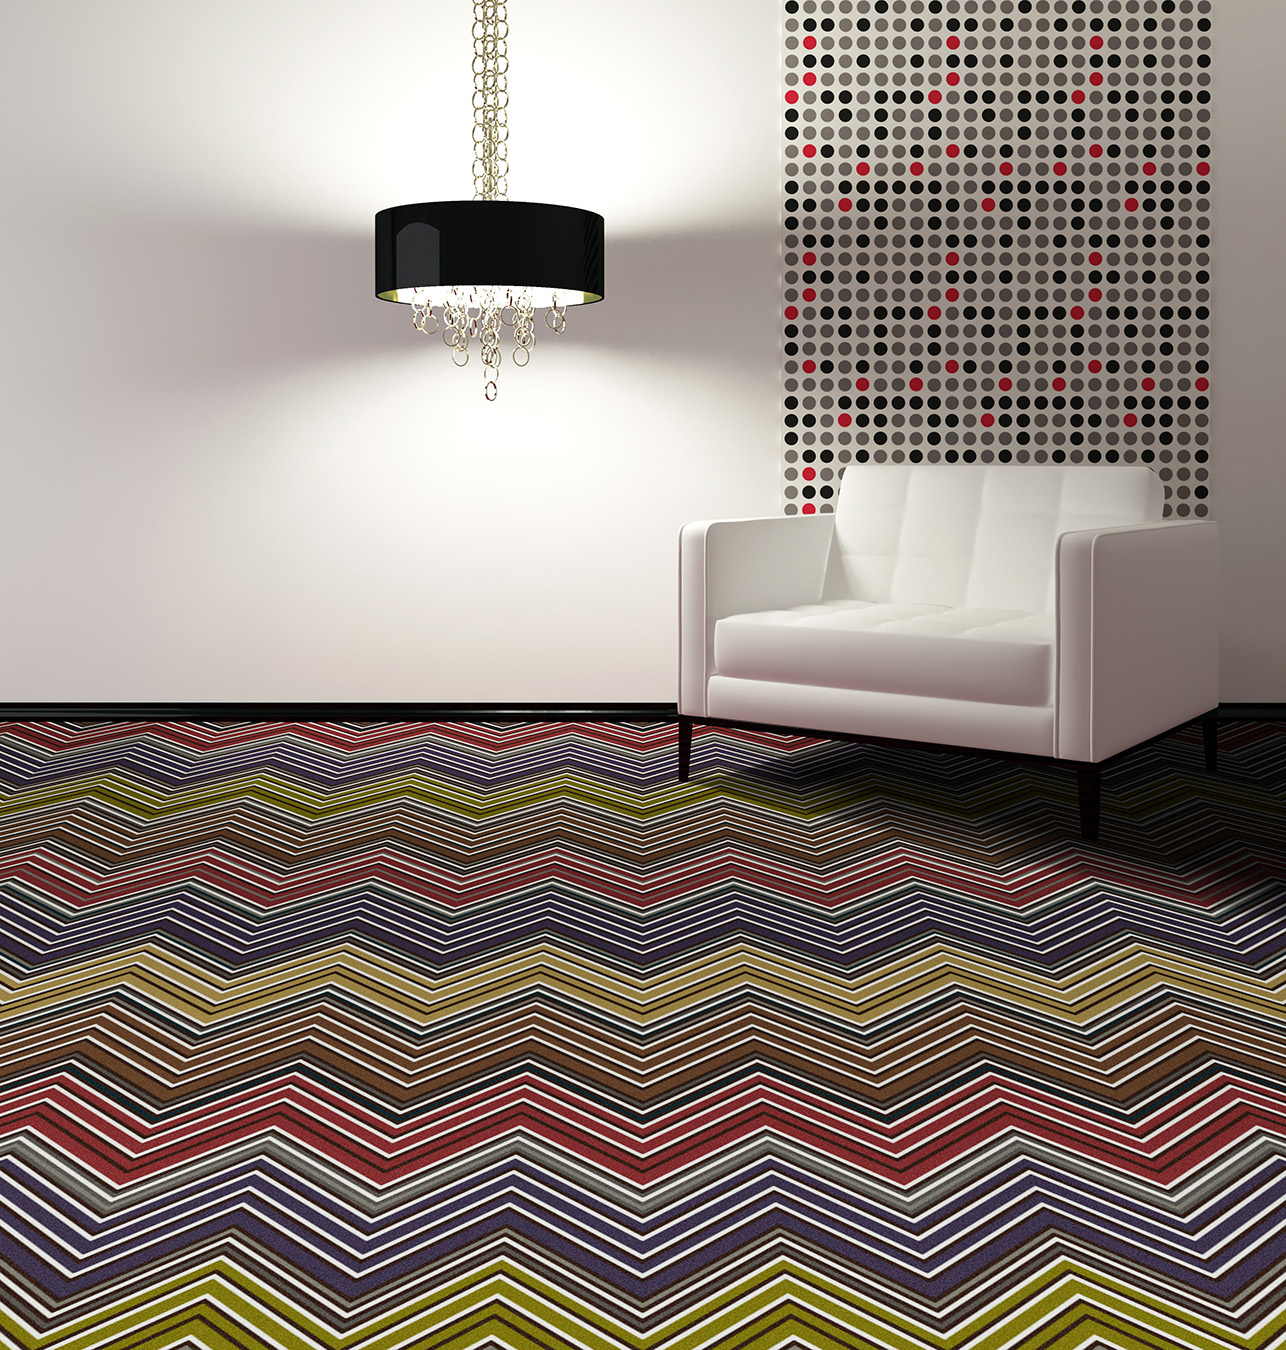 "Pattern #5524                              Pattern Name: Ziggity Zag  Pattern Repeat: 12"" x 72""  In Stock"